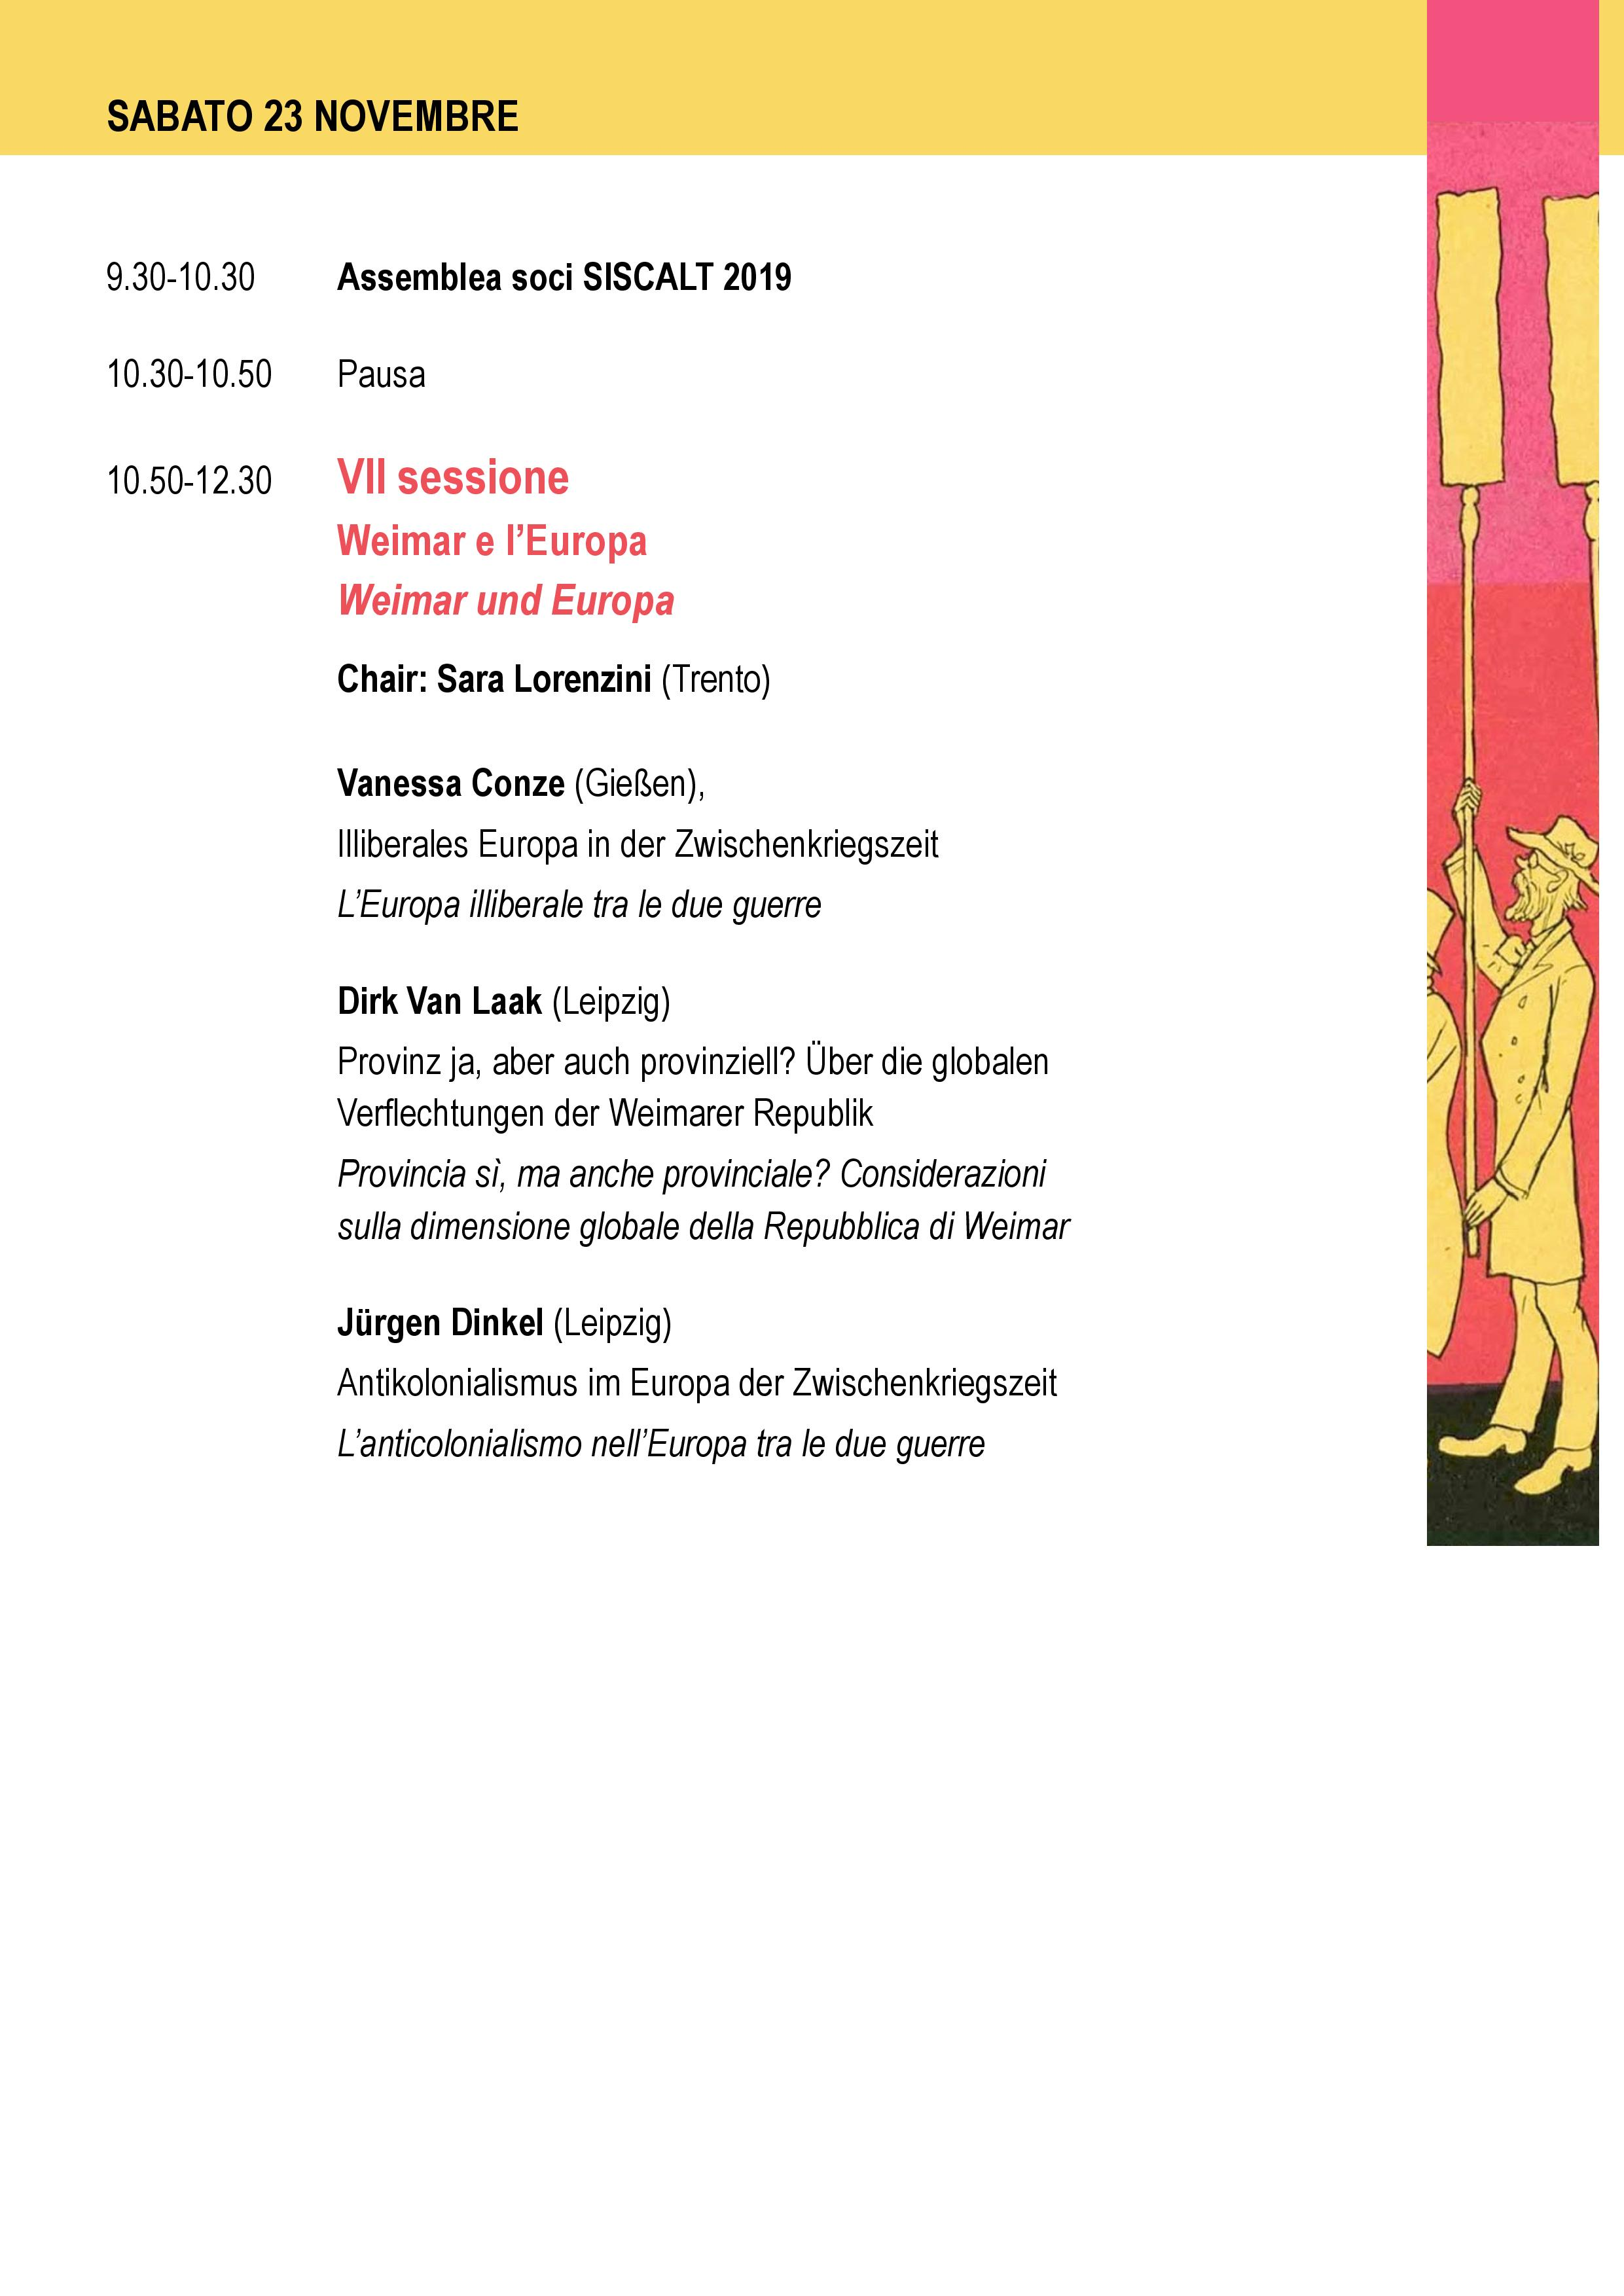 Programma SISCALT-page-010